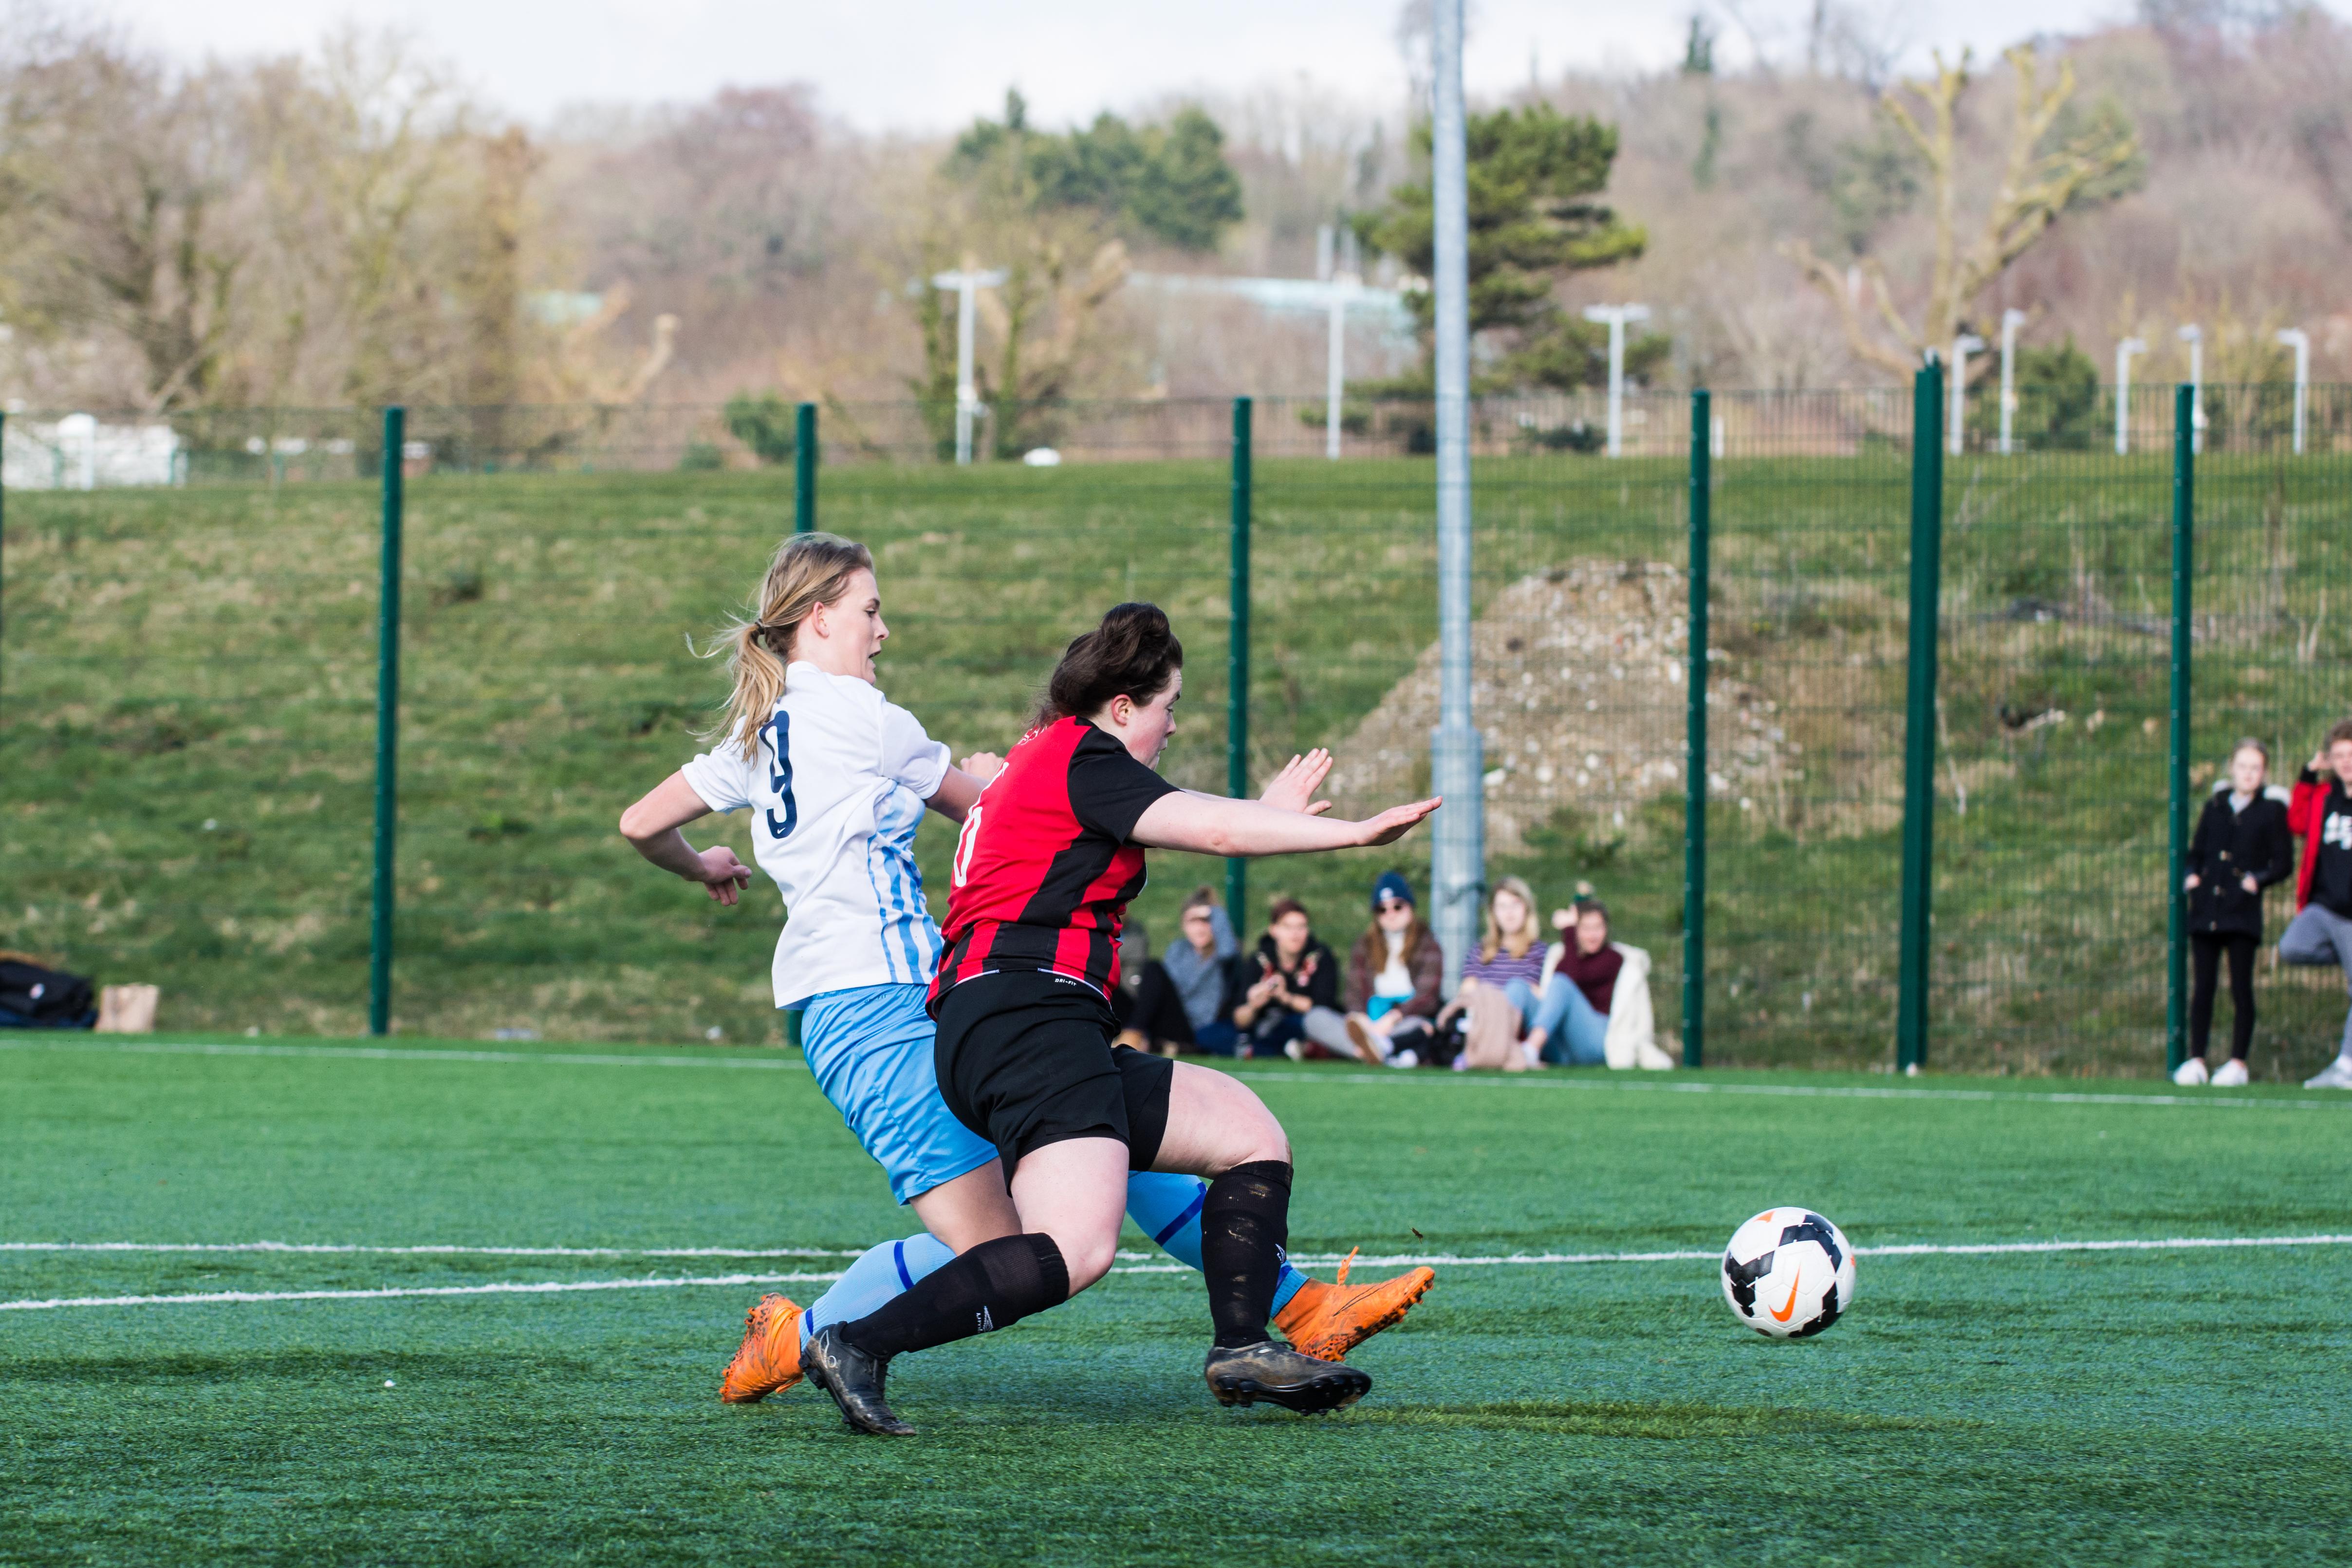 DAVID_JEFFERY Saltdean Utd Ladies FC vs Worthing Utd Ladies FC 11.03.18 13